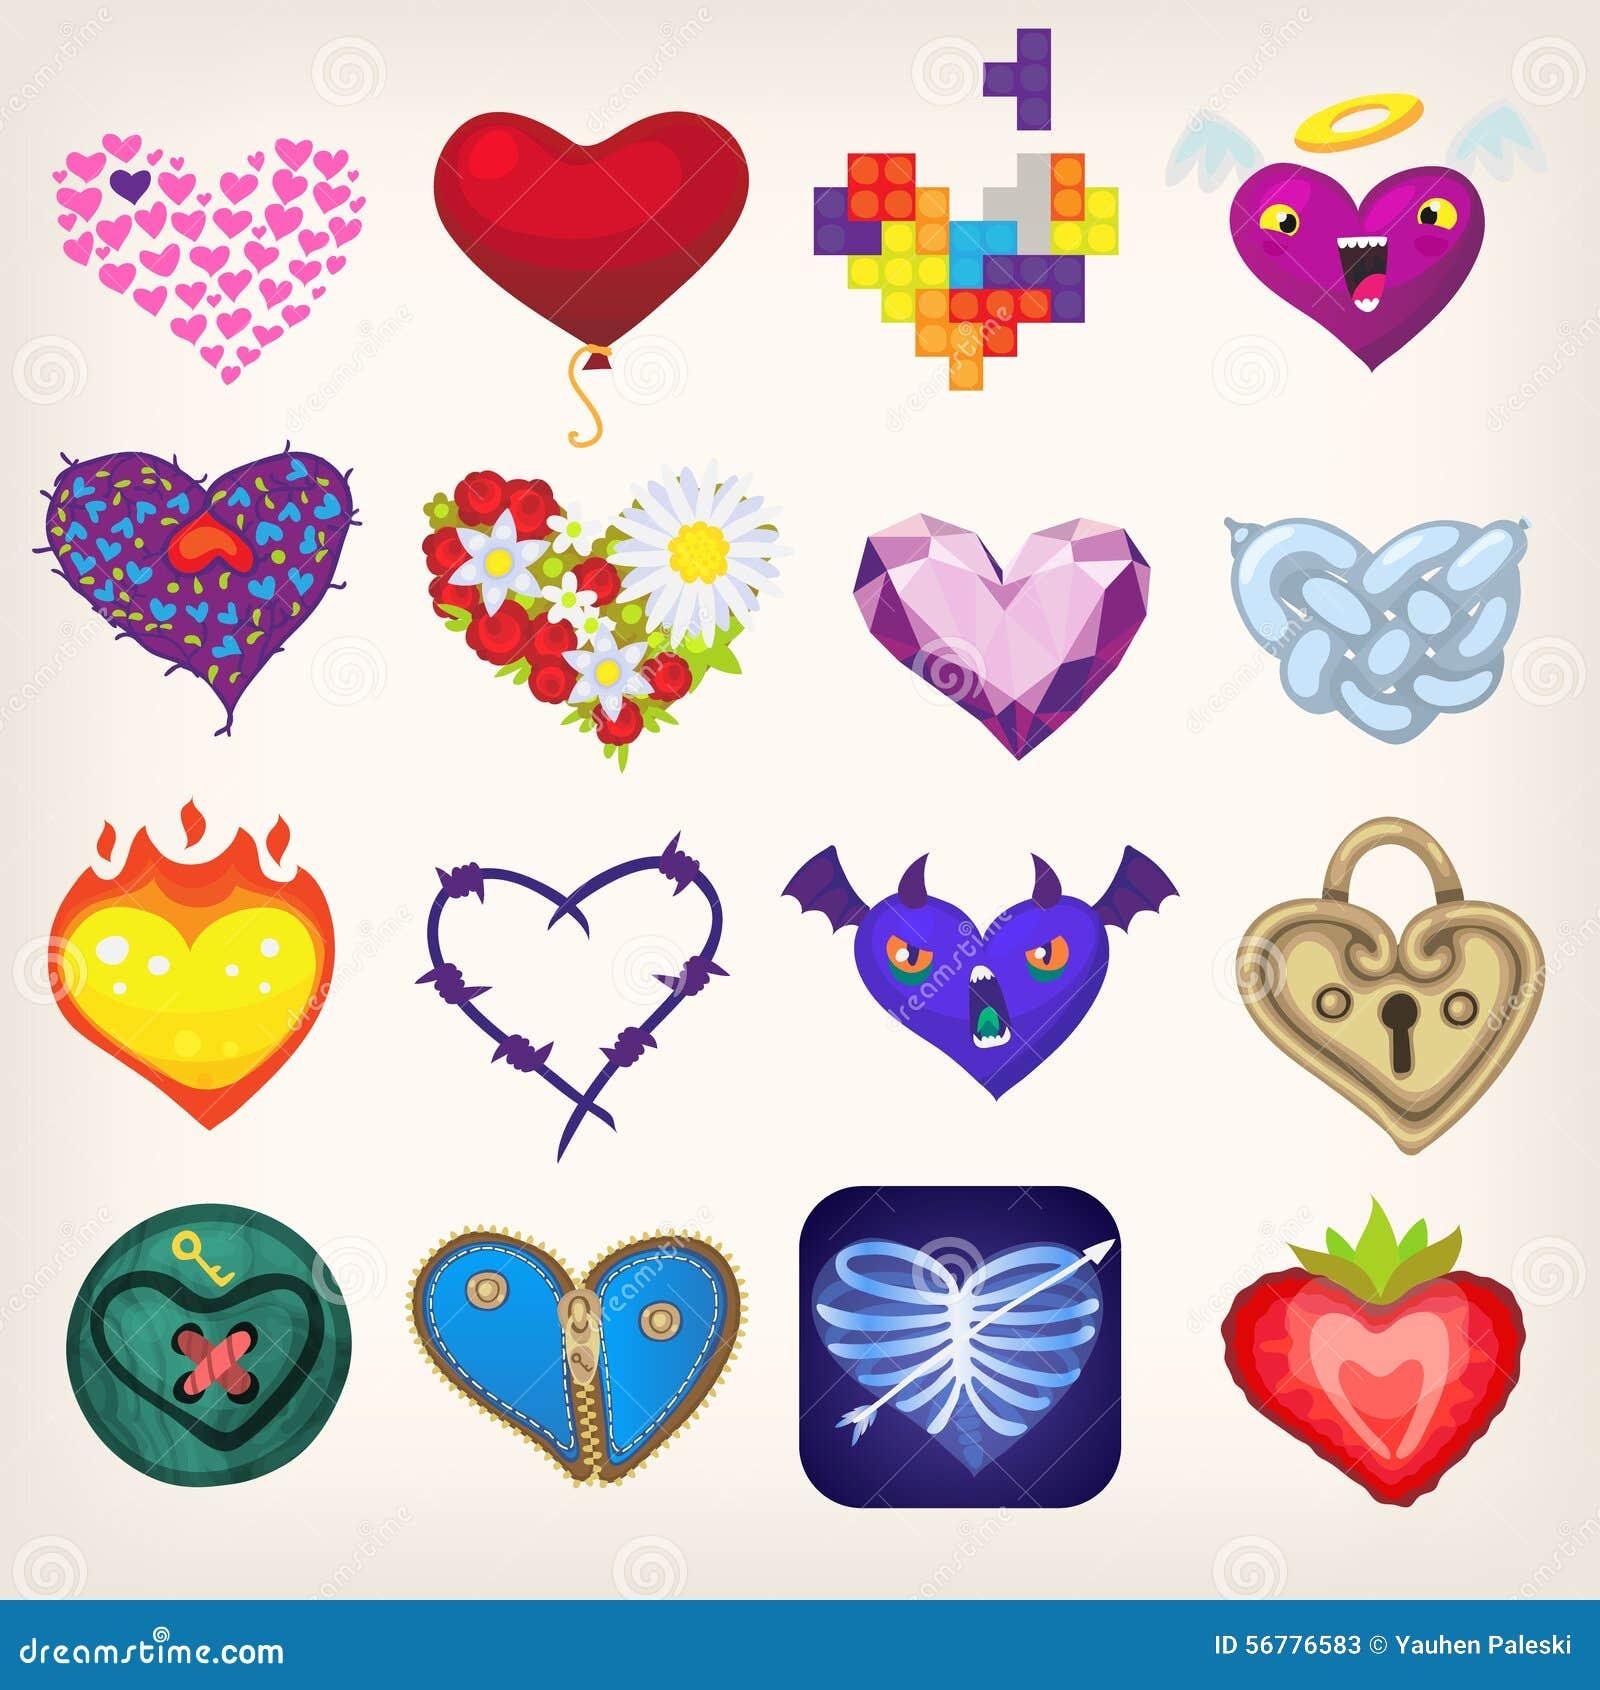 Angel And Devil Hearts Cartoon Vector